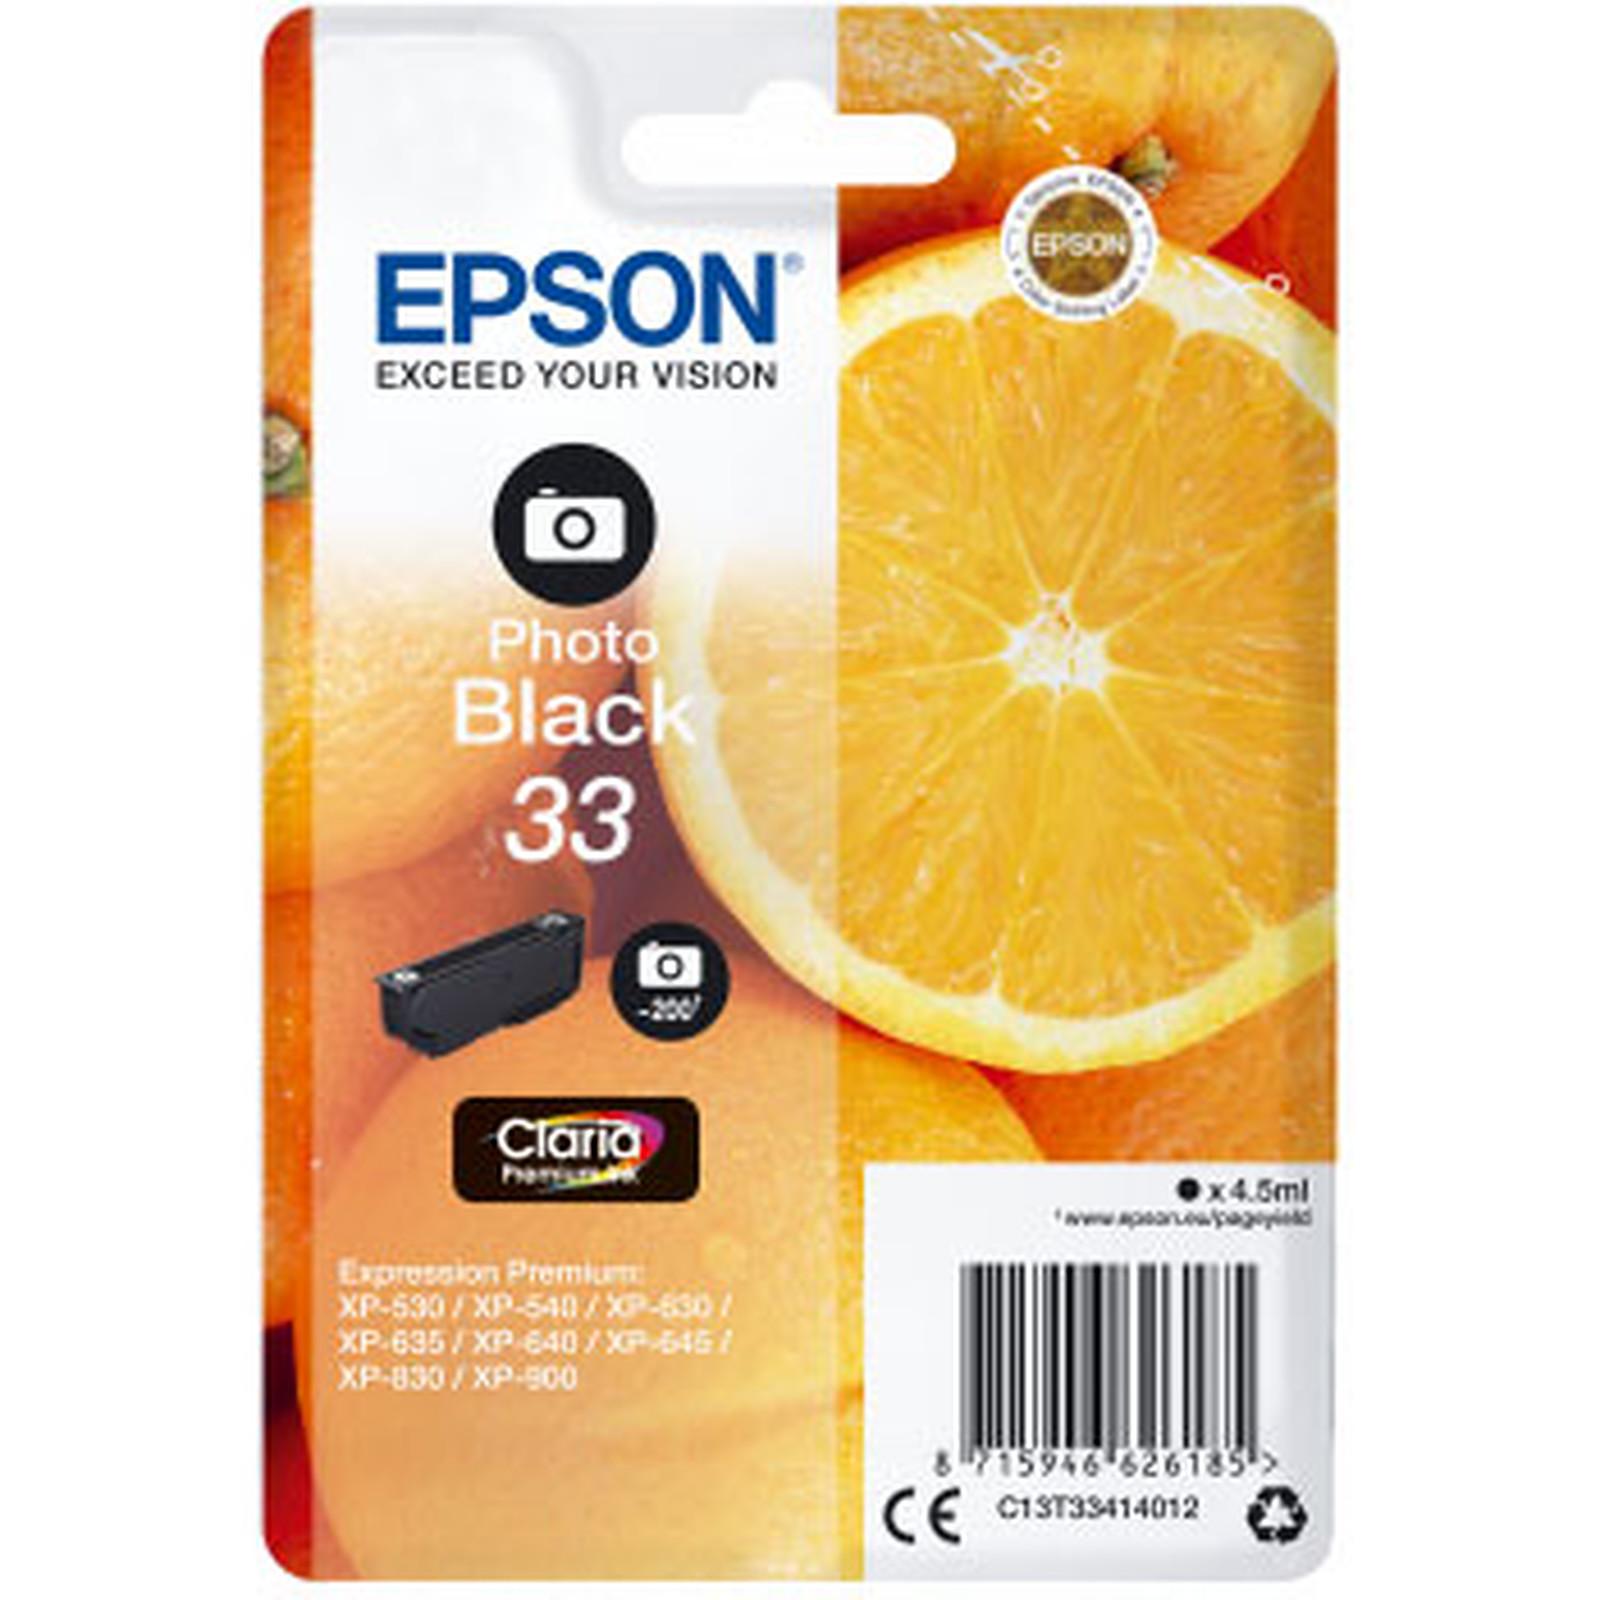 Epson Oranges 33 Noir Photo